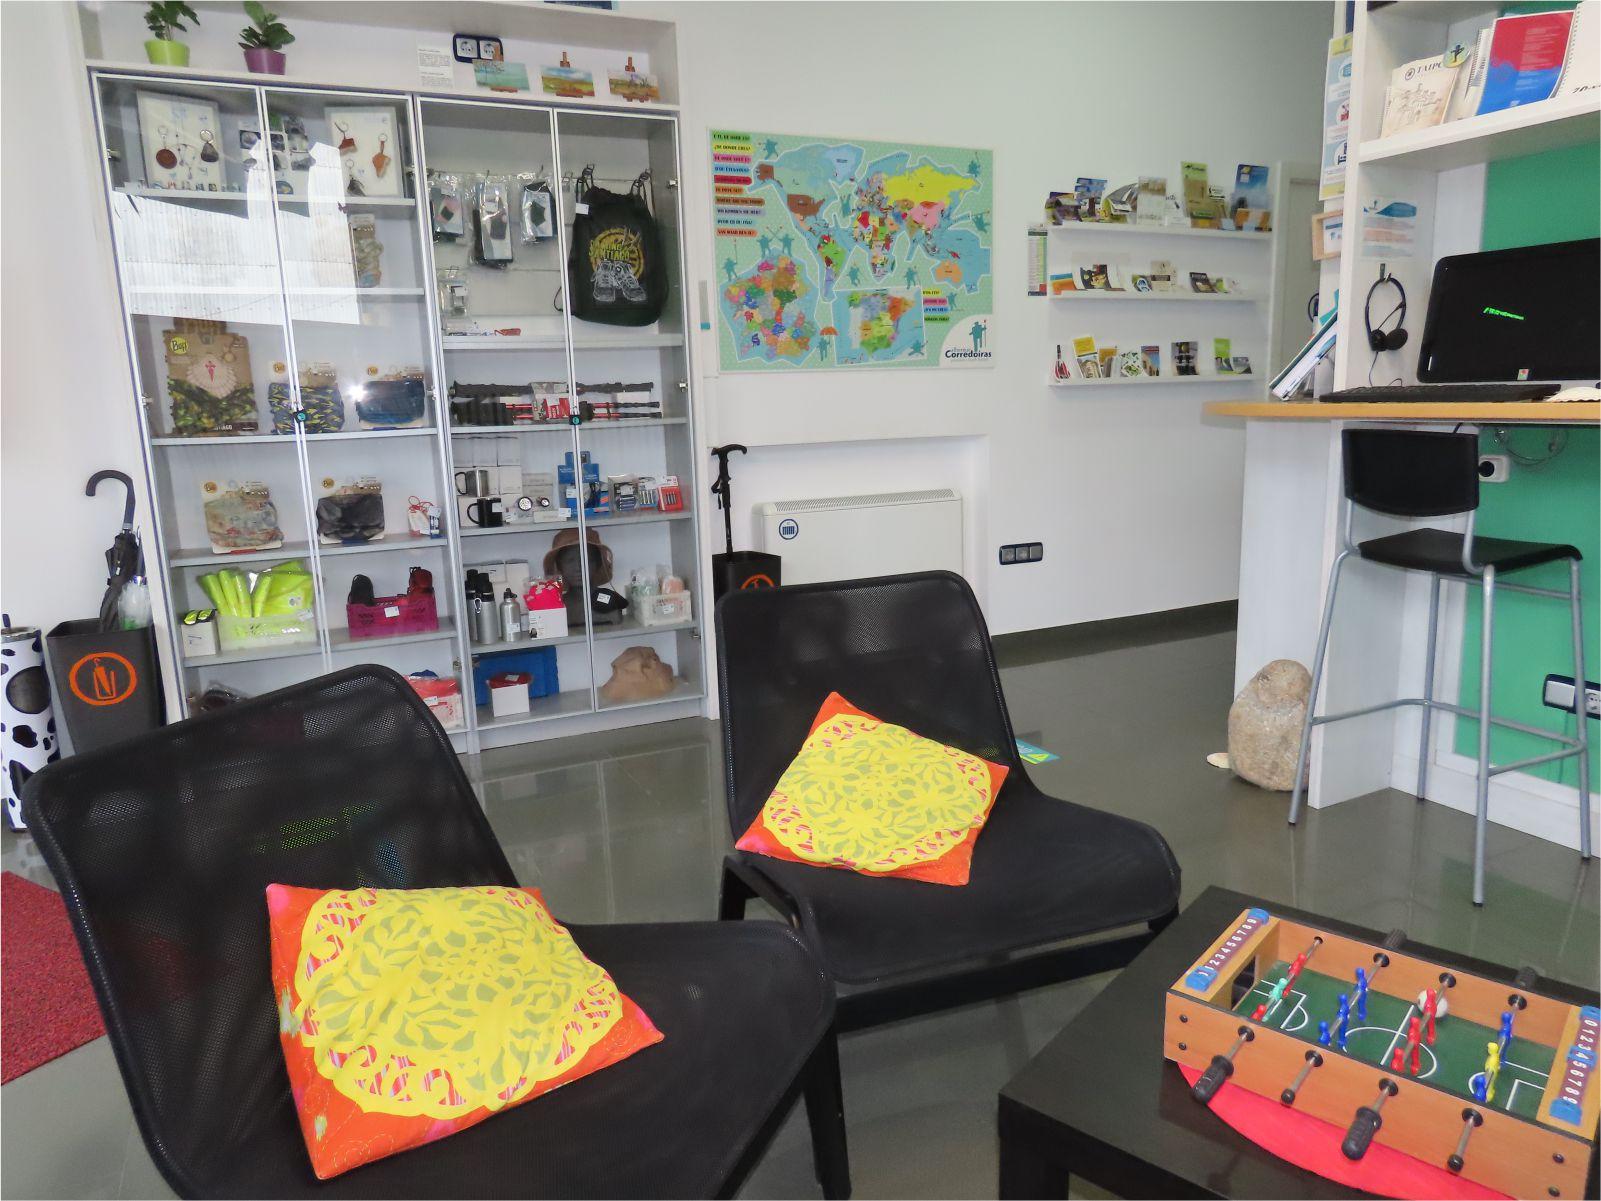 Detalle Sala - Living room - Albergue Corredoiras